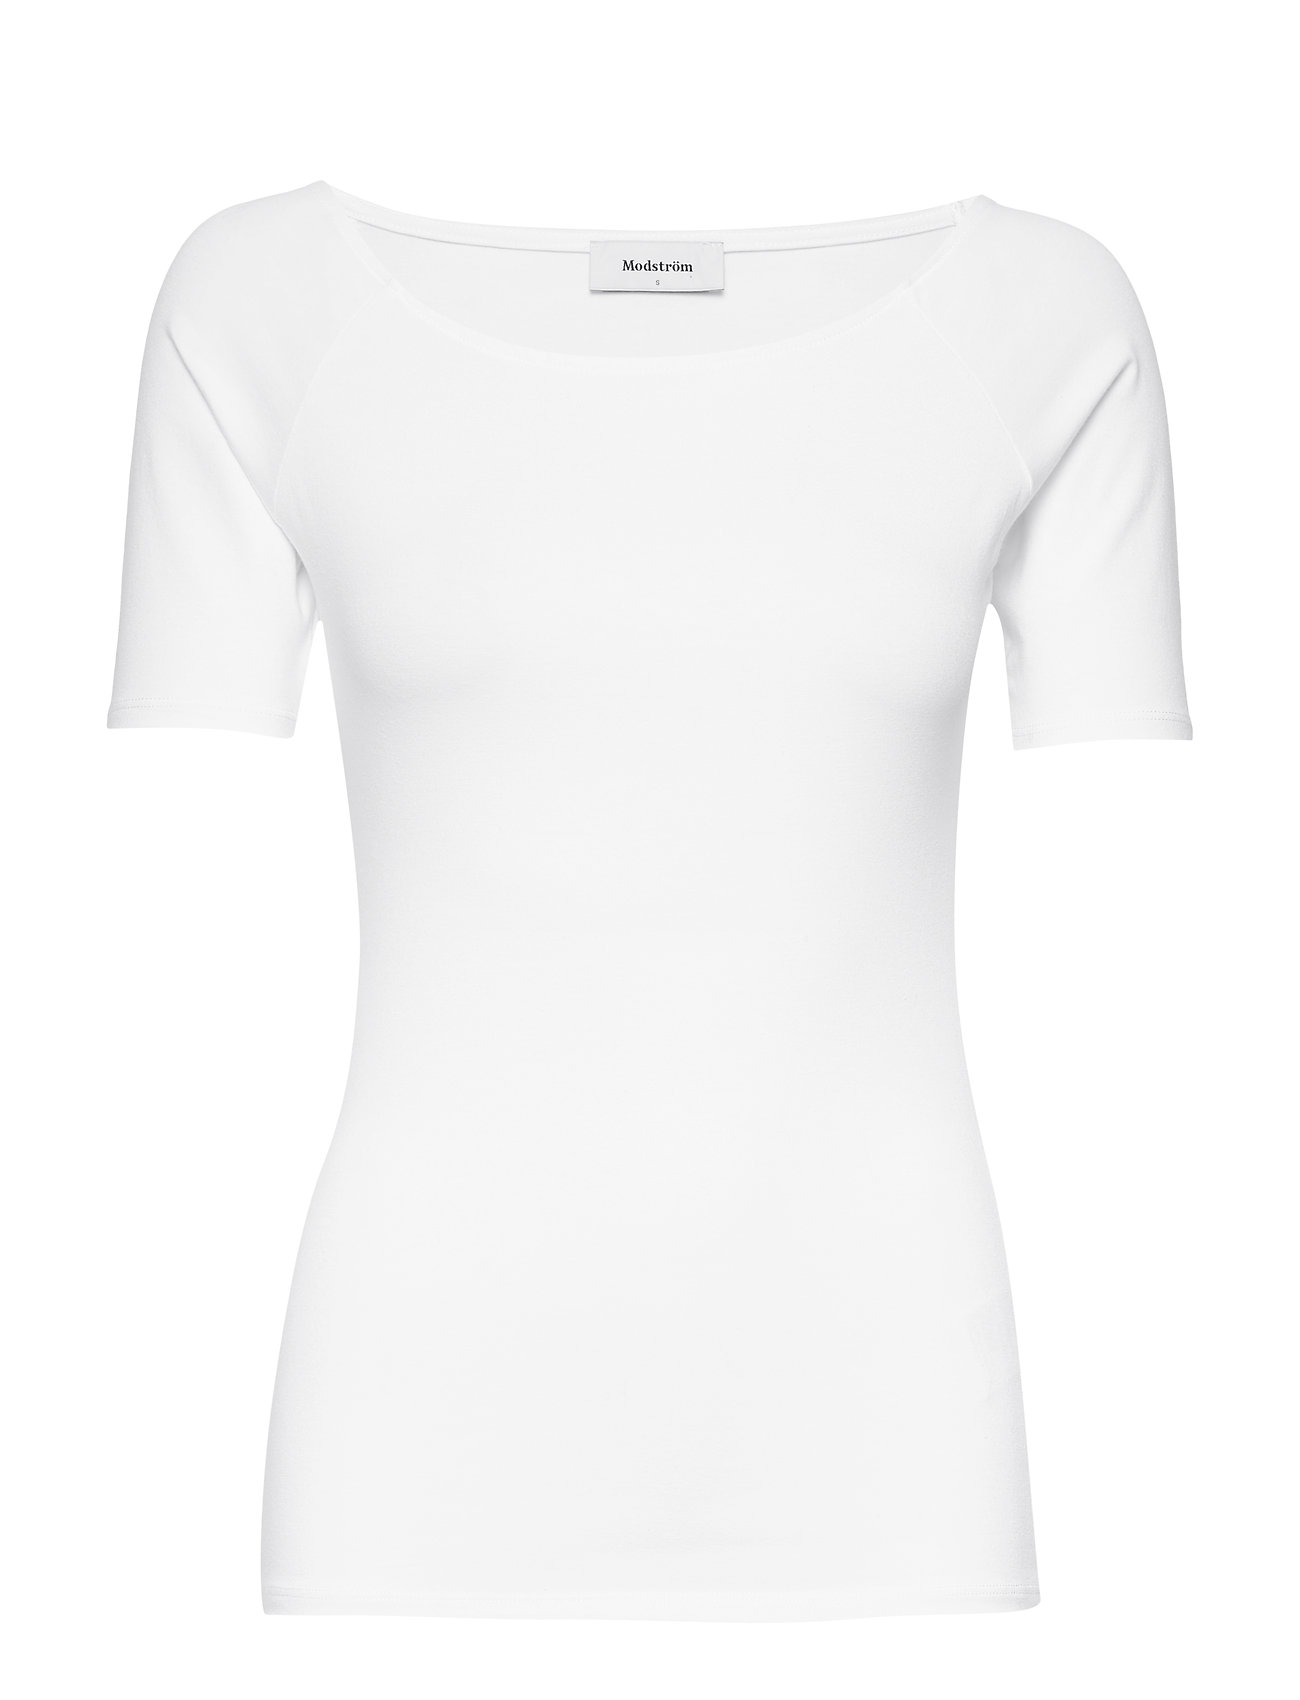 Image of Tansy Top T-shirt Top Hvid Modström (3218387625)